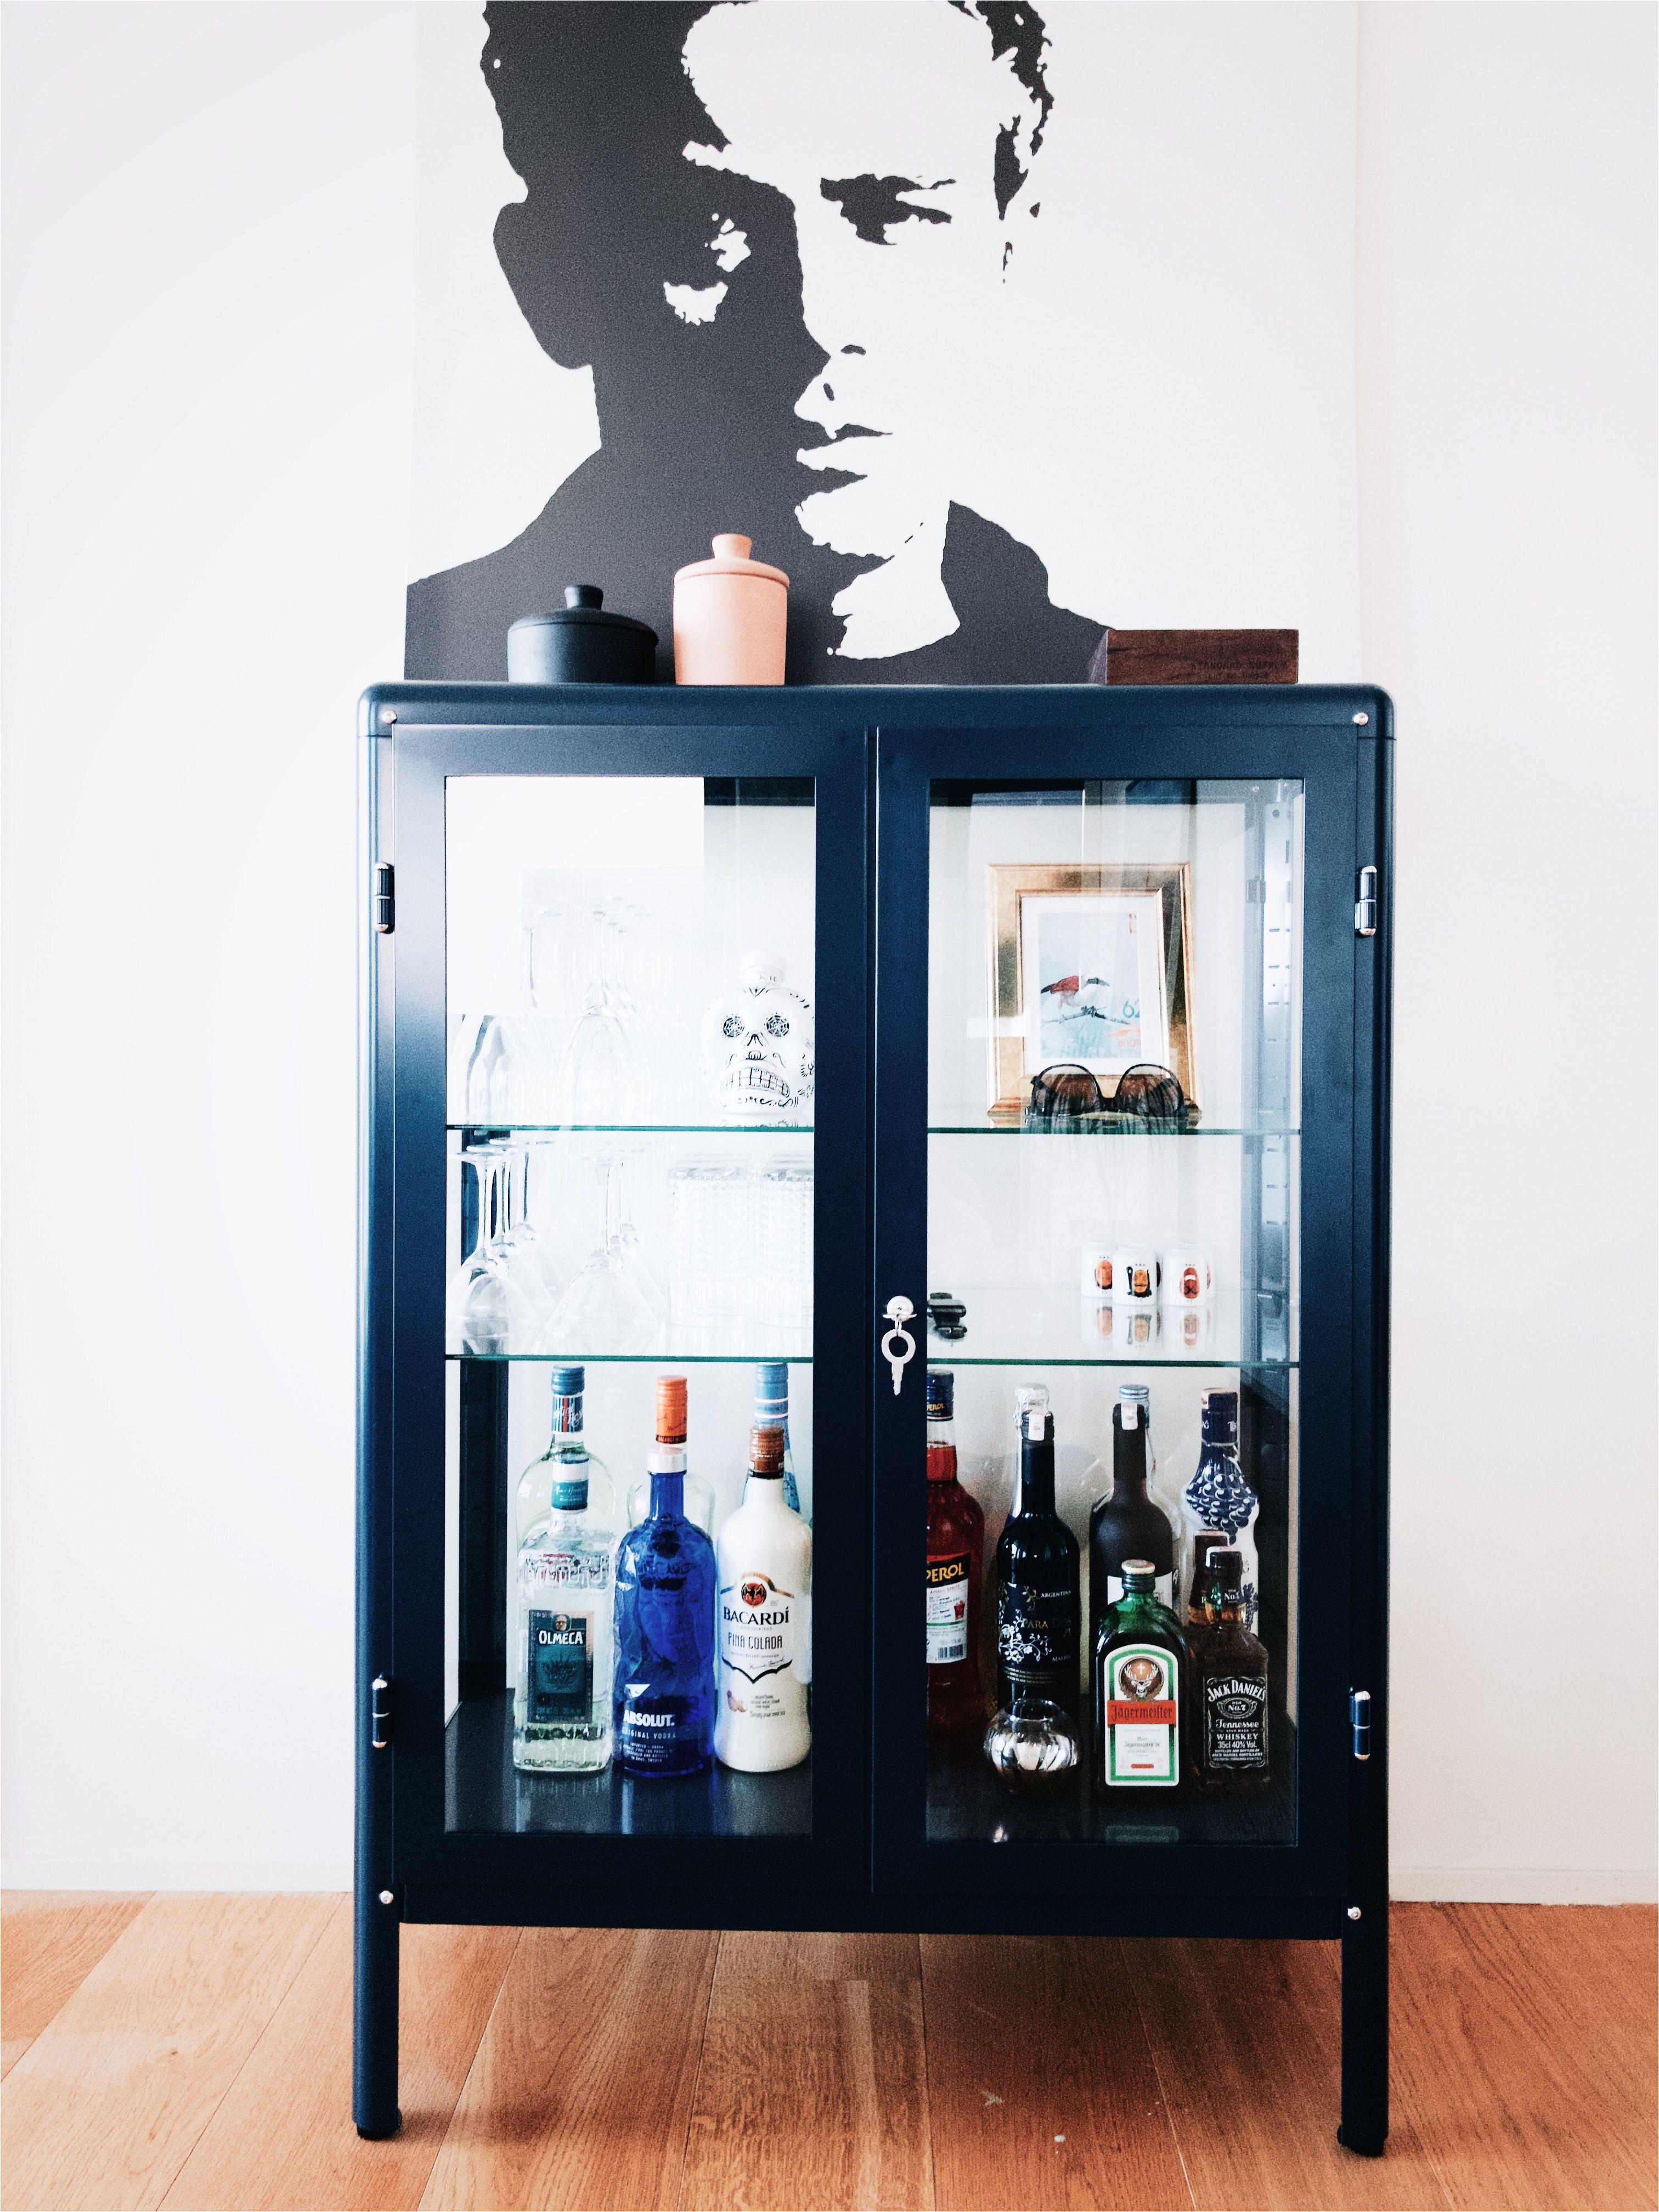 Locked Liquor Cabinet Ikea Cabinet Ikea Fabrikor Bufet Cave Sweet Cave In 2019 Pinterest